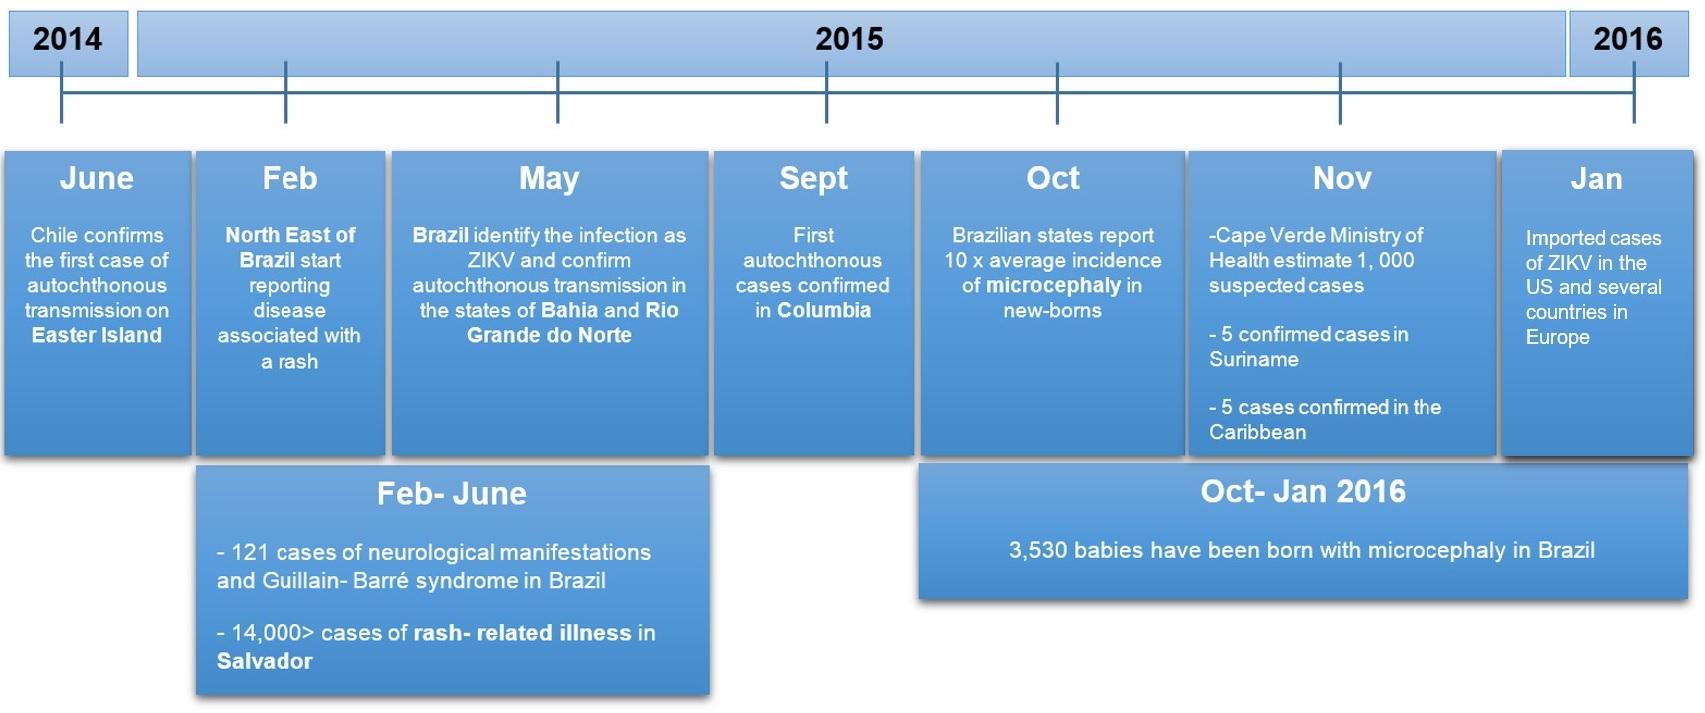 ZIKV summary timeline (Vera Unwin)